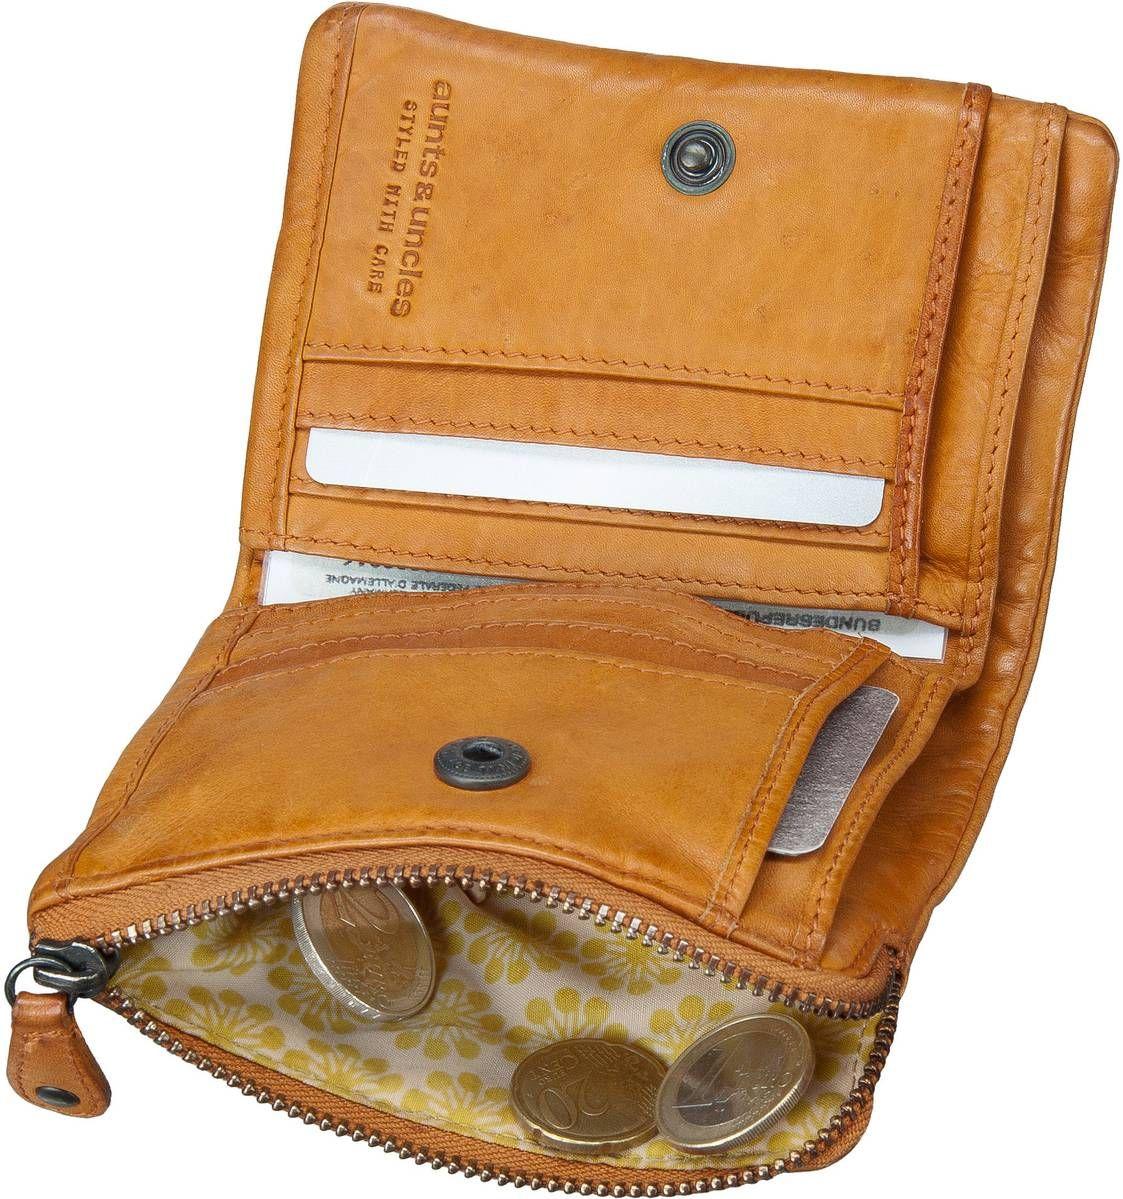 cumin seed bags wallets aunts uncles bags aunt. Black Bedroom Furniture Sets. Home Design Ideas